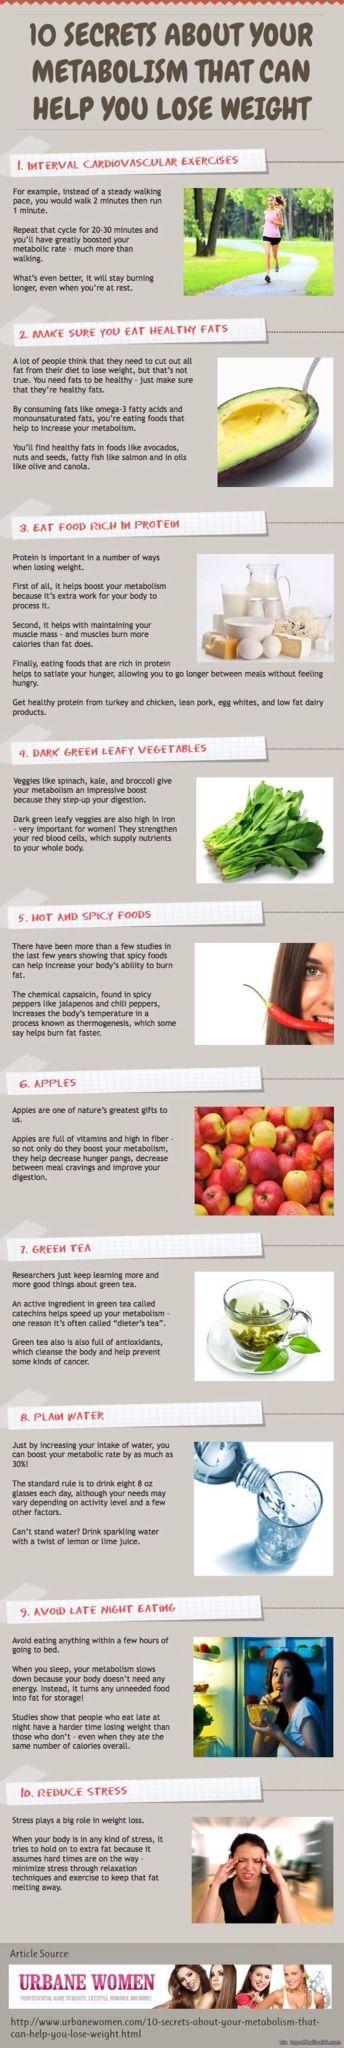 Vida saludable